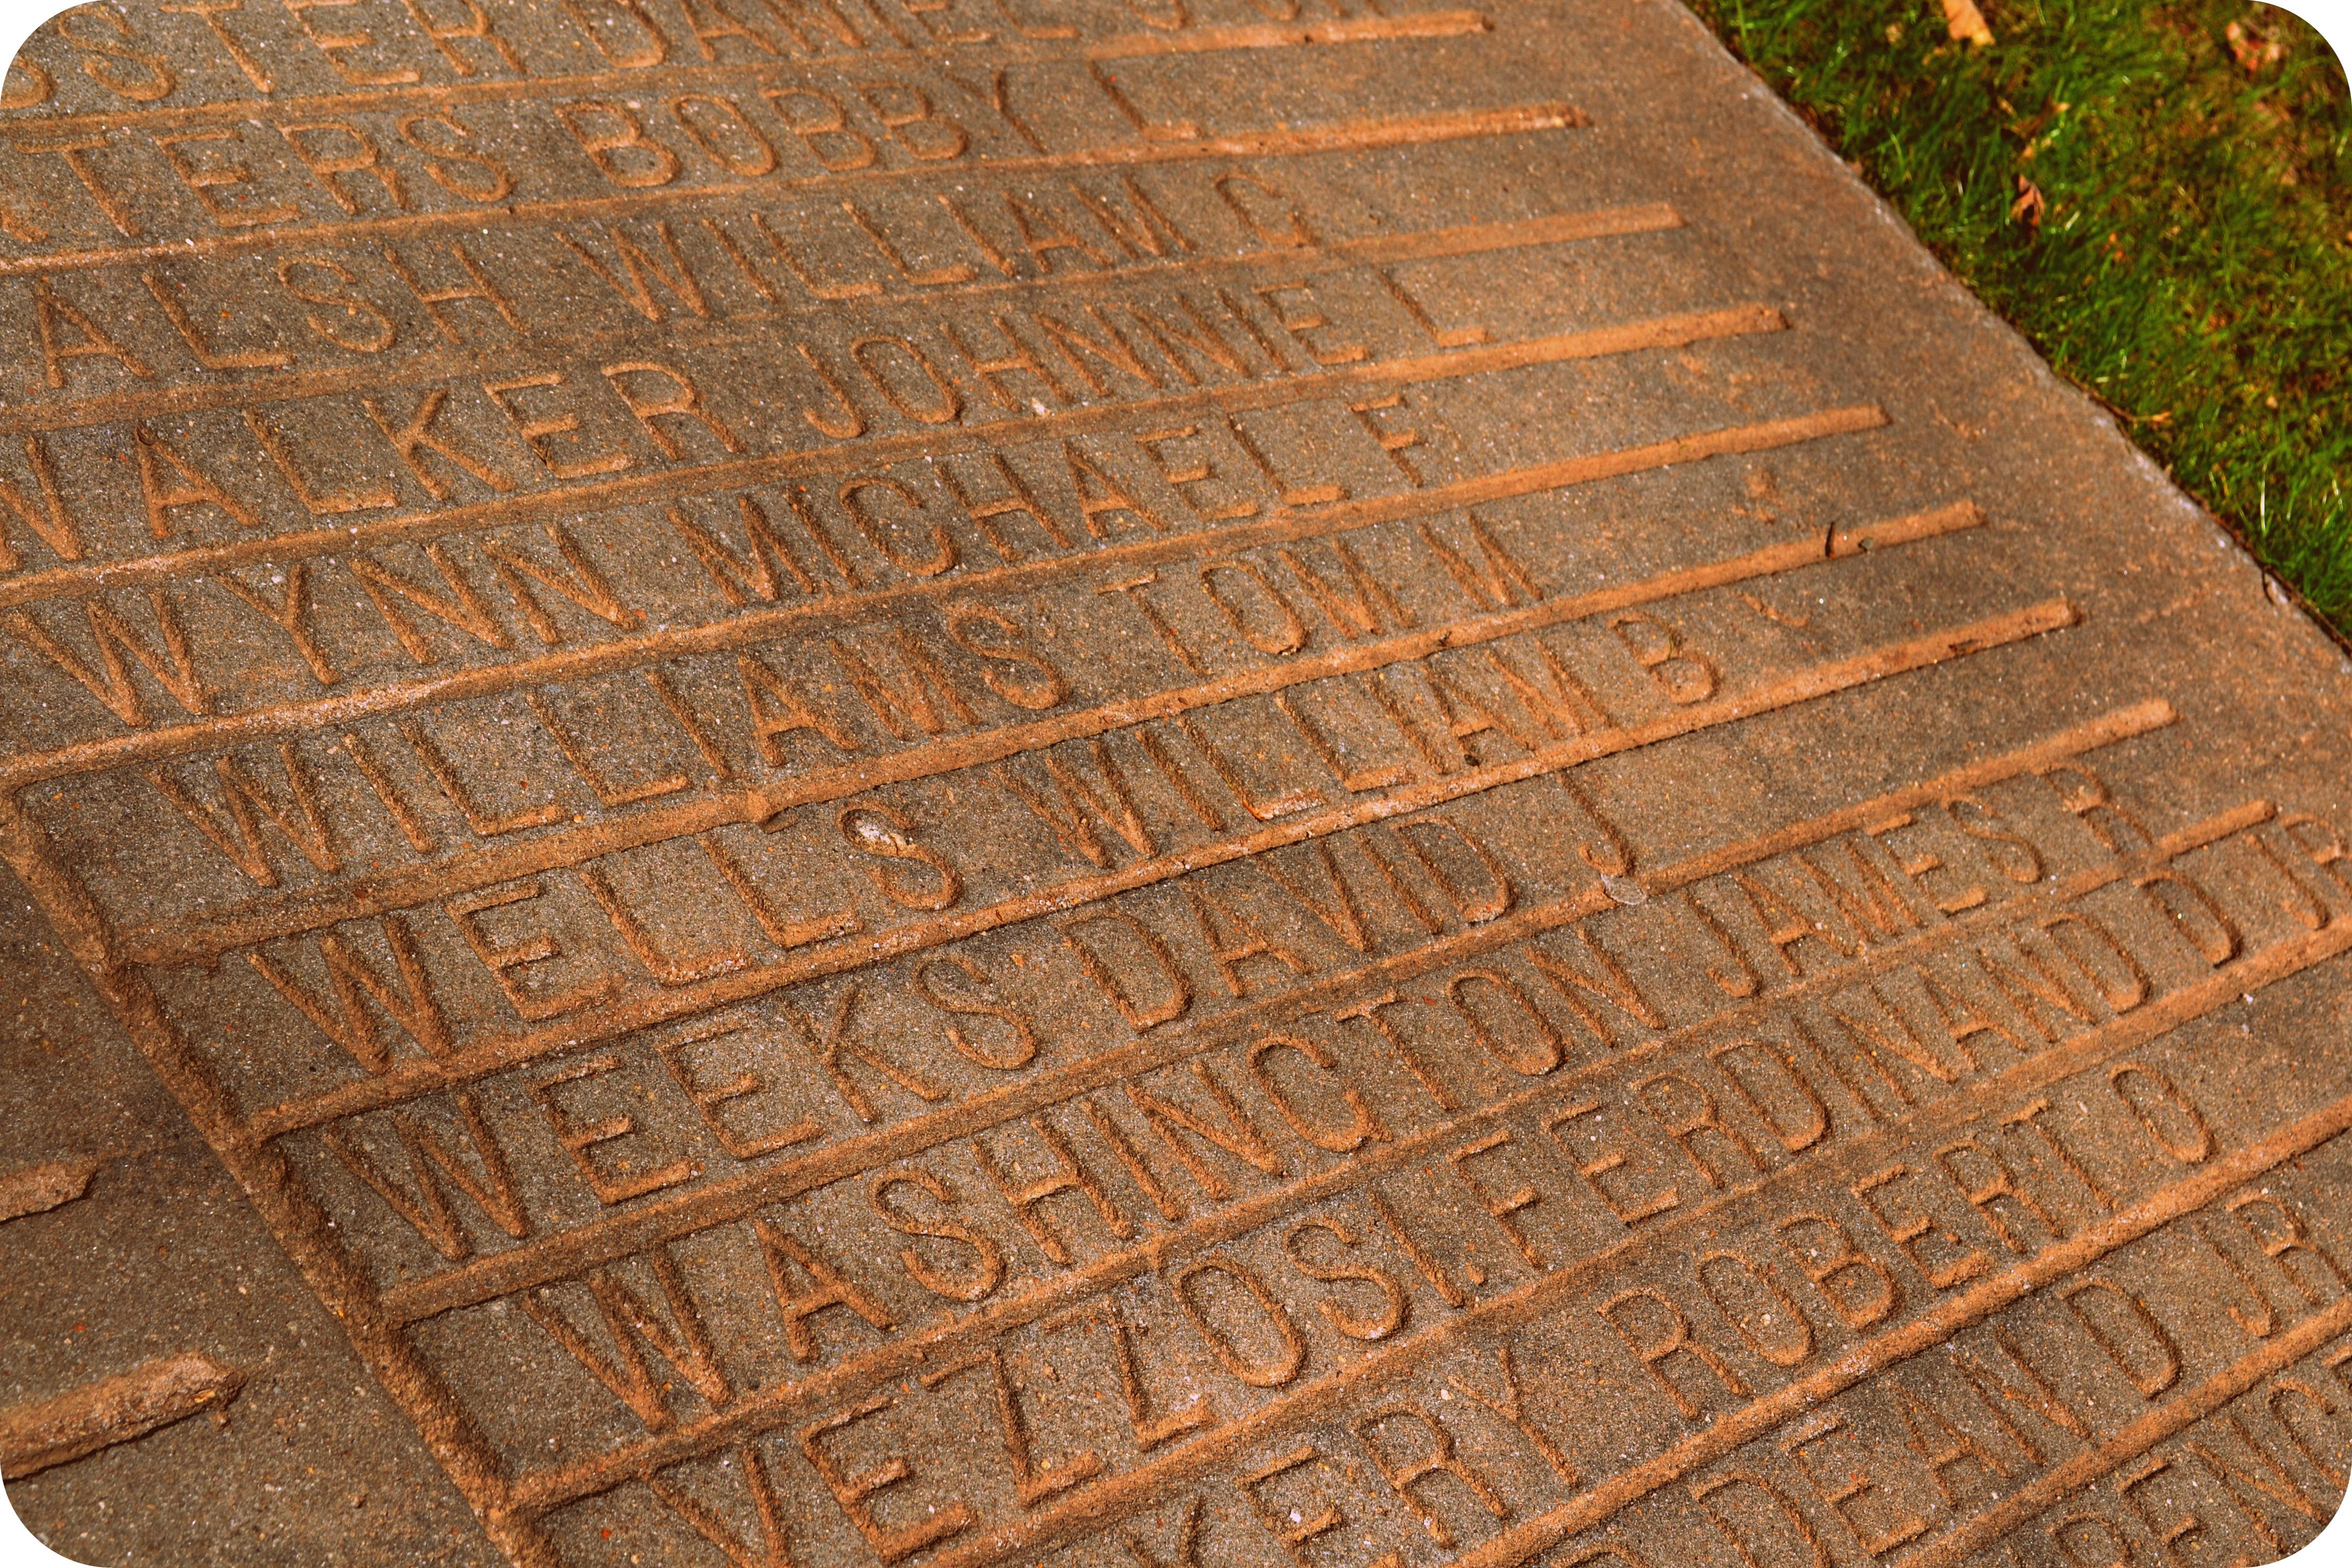 Keno bricks